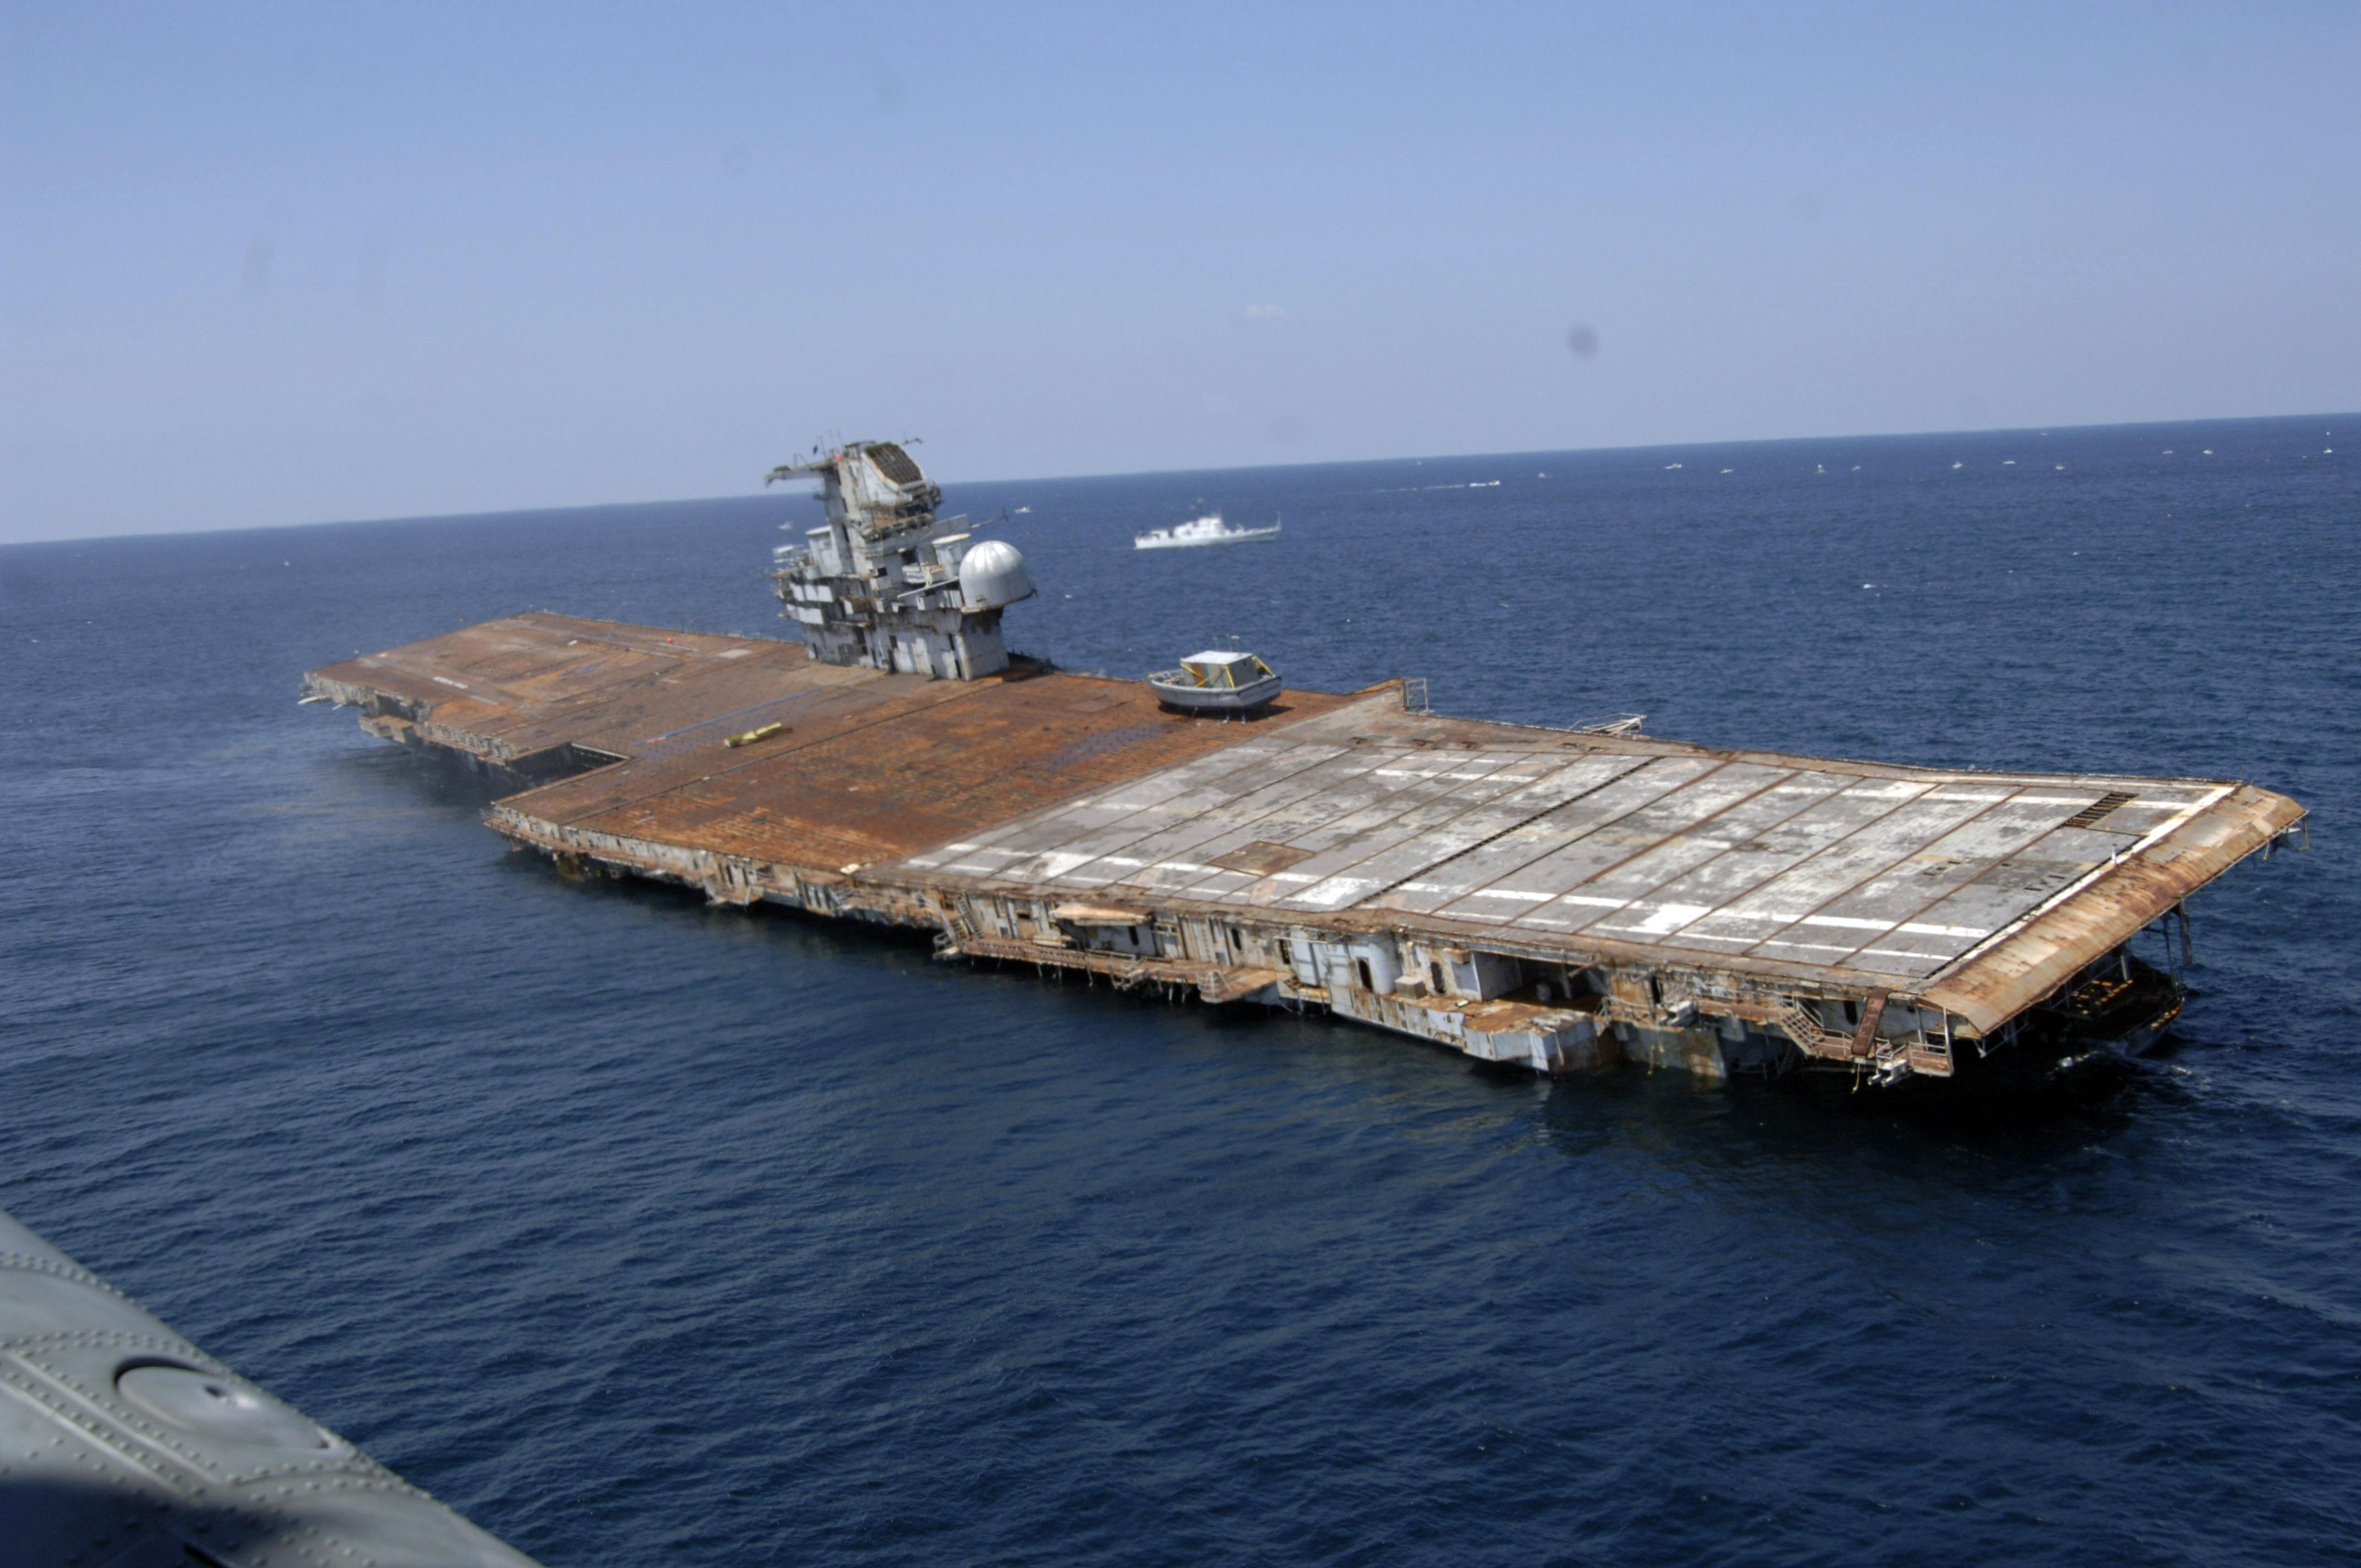 Fileus Navy 060517 N 7992k 009 The Ex Oriskany A